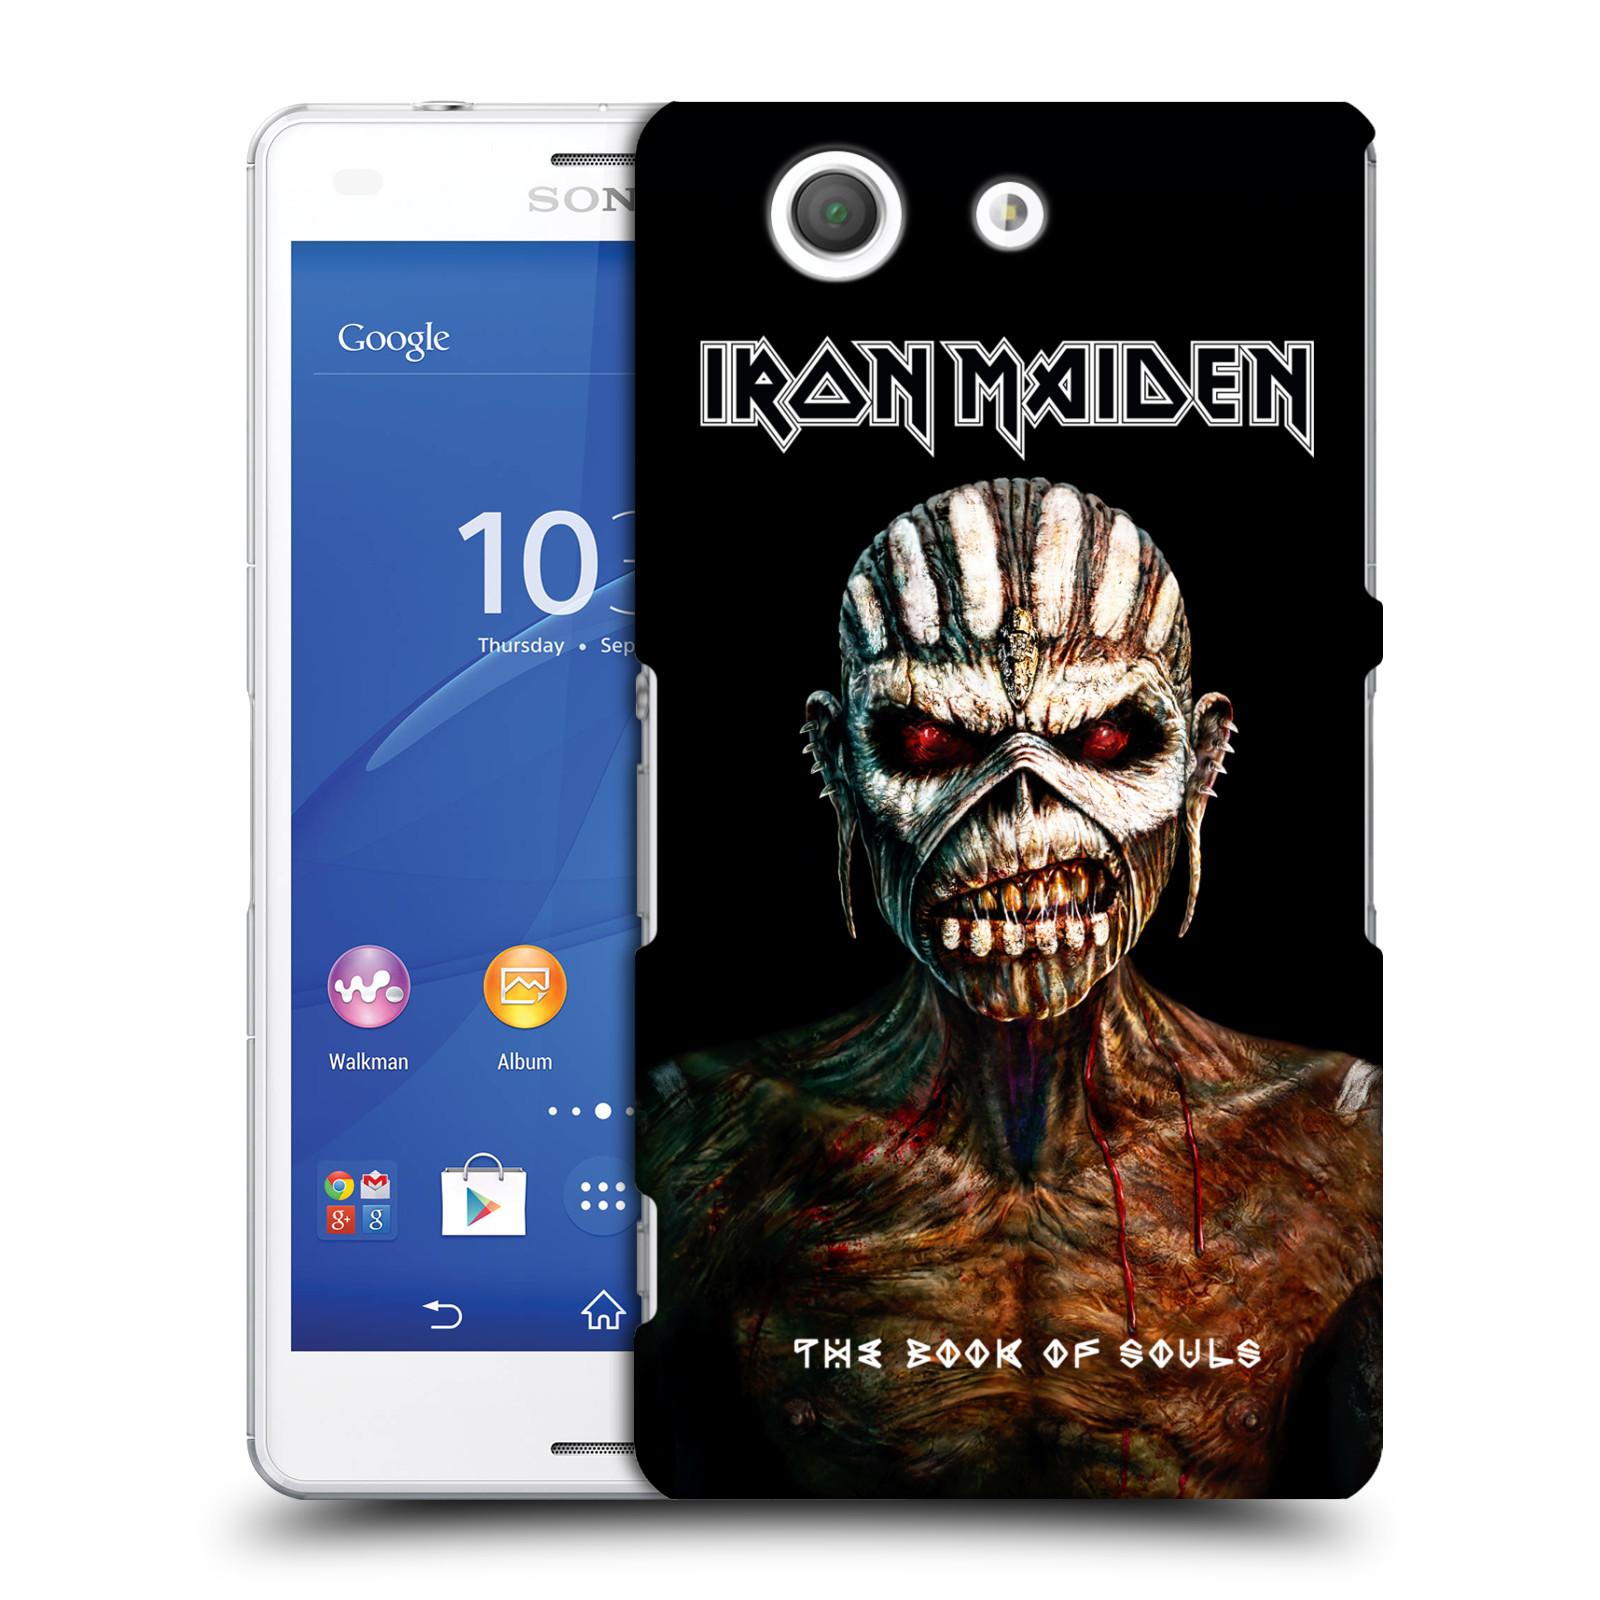 Plastové pouzdro na mobil Sony Xperia Z3 Compact D5803 HEAD CASE - Iron Maiden - The Book Of Souls